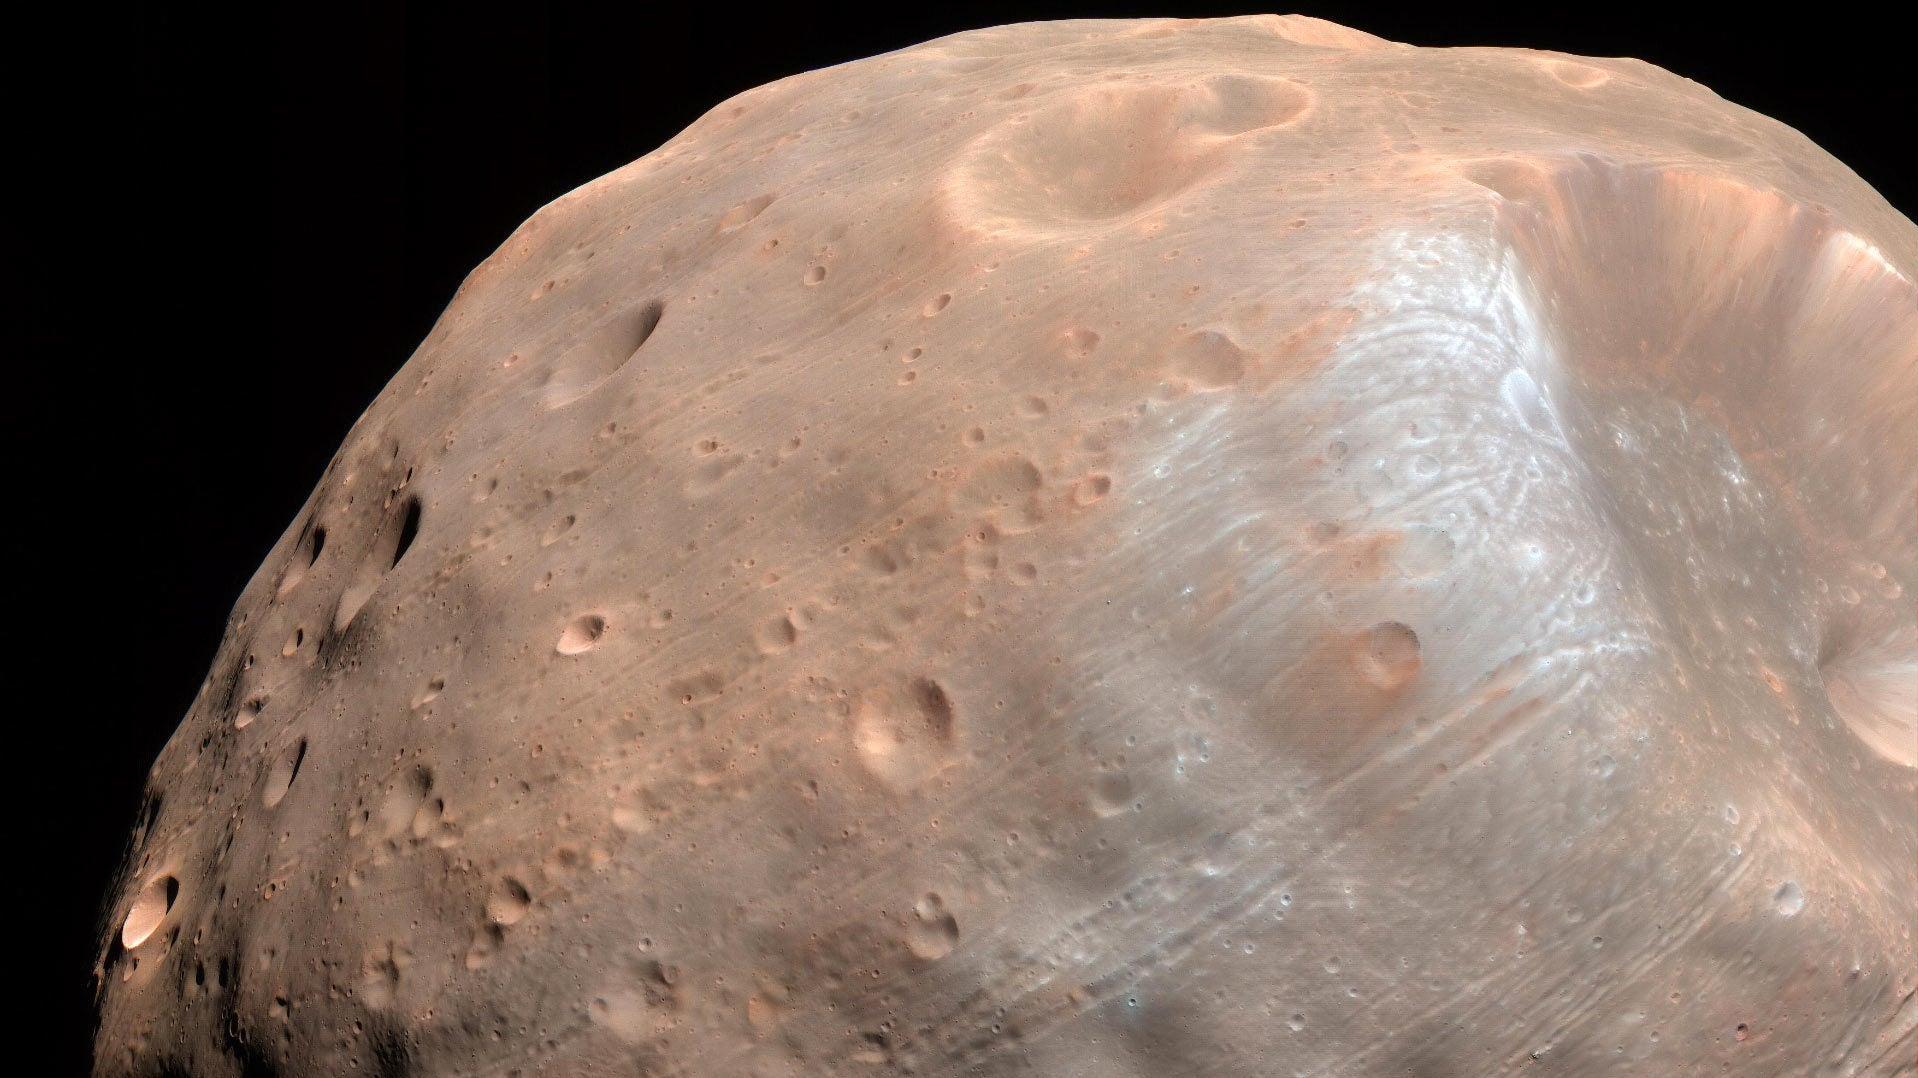 Bouncing Boulders May Finally Explain How Mars' Ugliest Moon Got Its Stripes